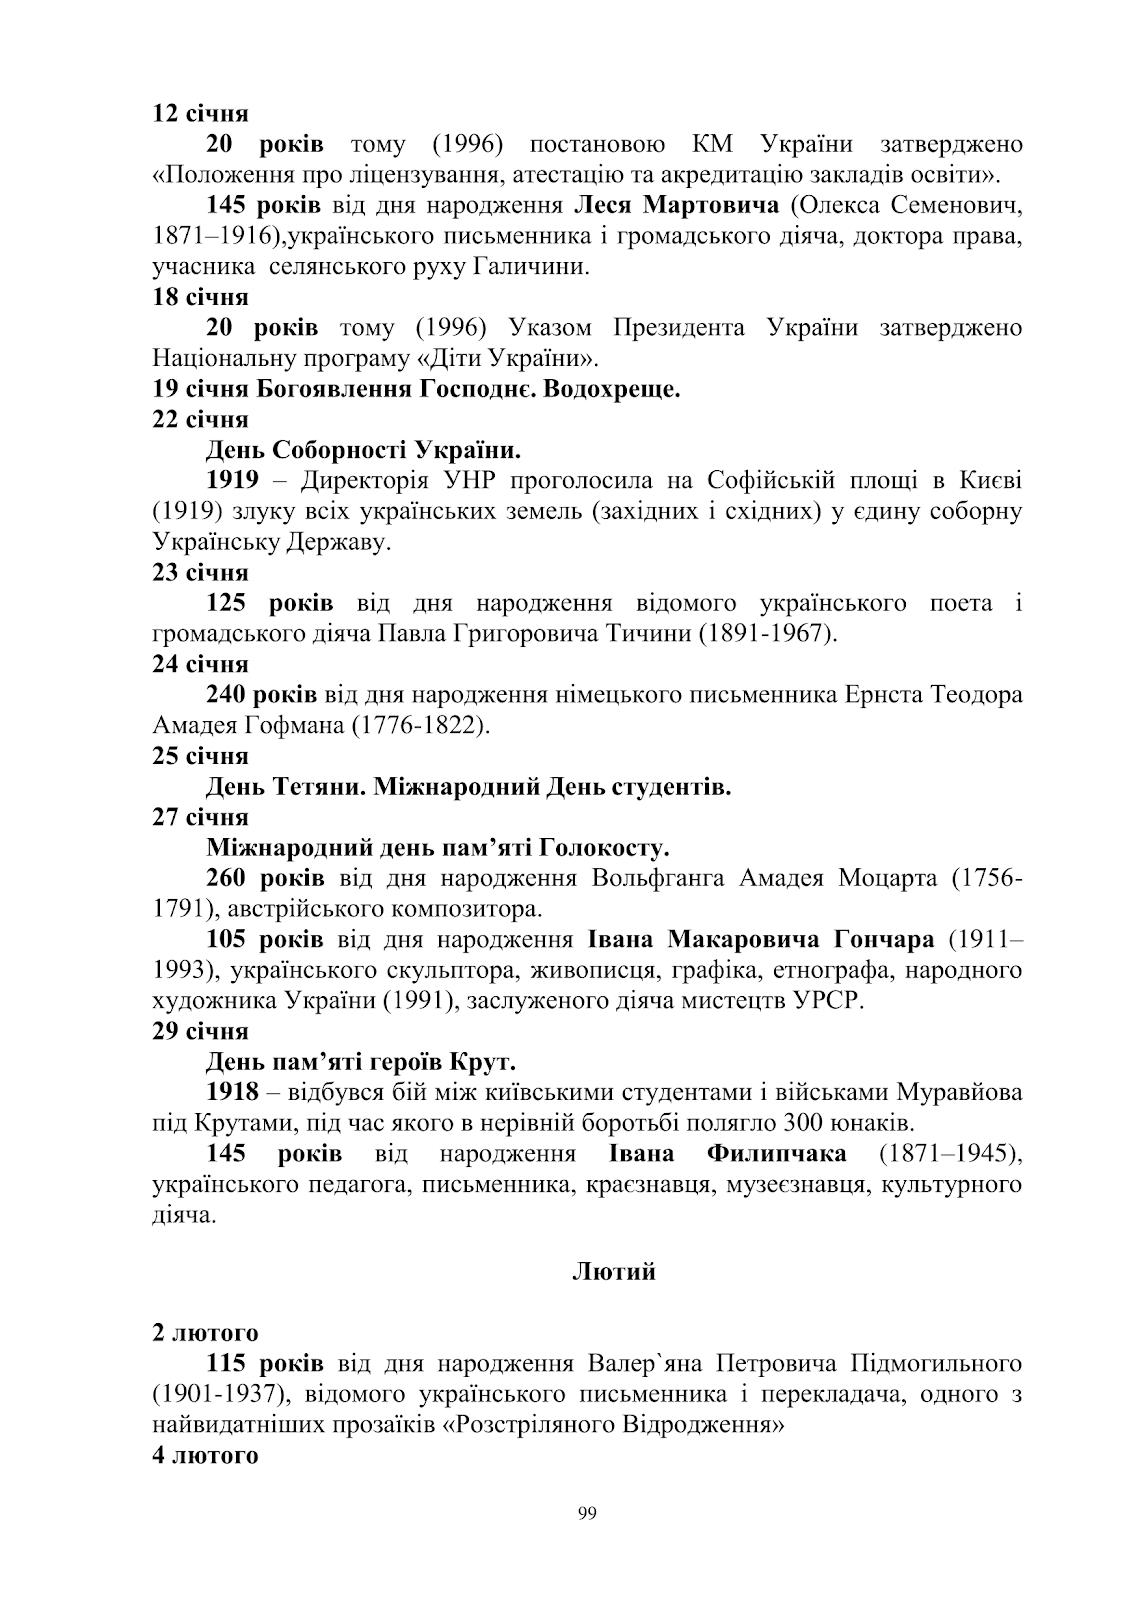 C:\Users\Валерия\Desktop\план 2016 рік\план 2016 рік-099.png